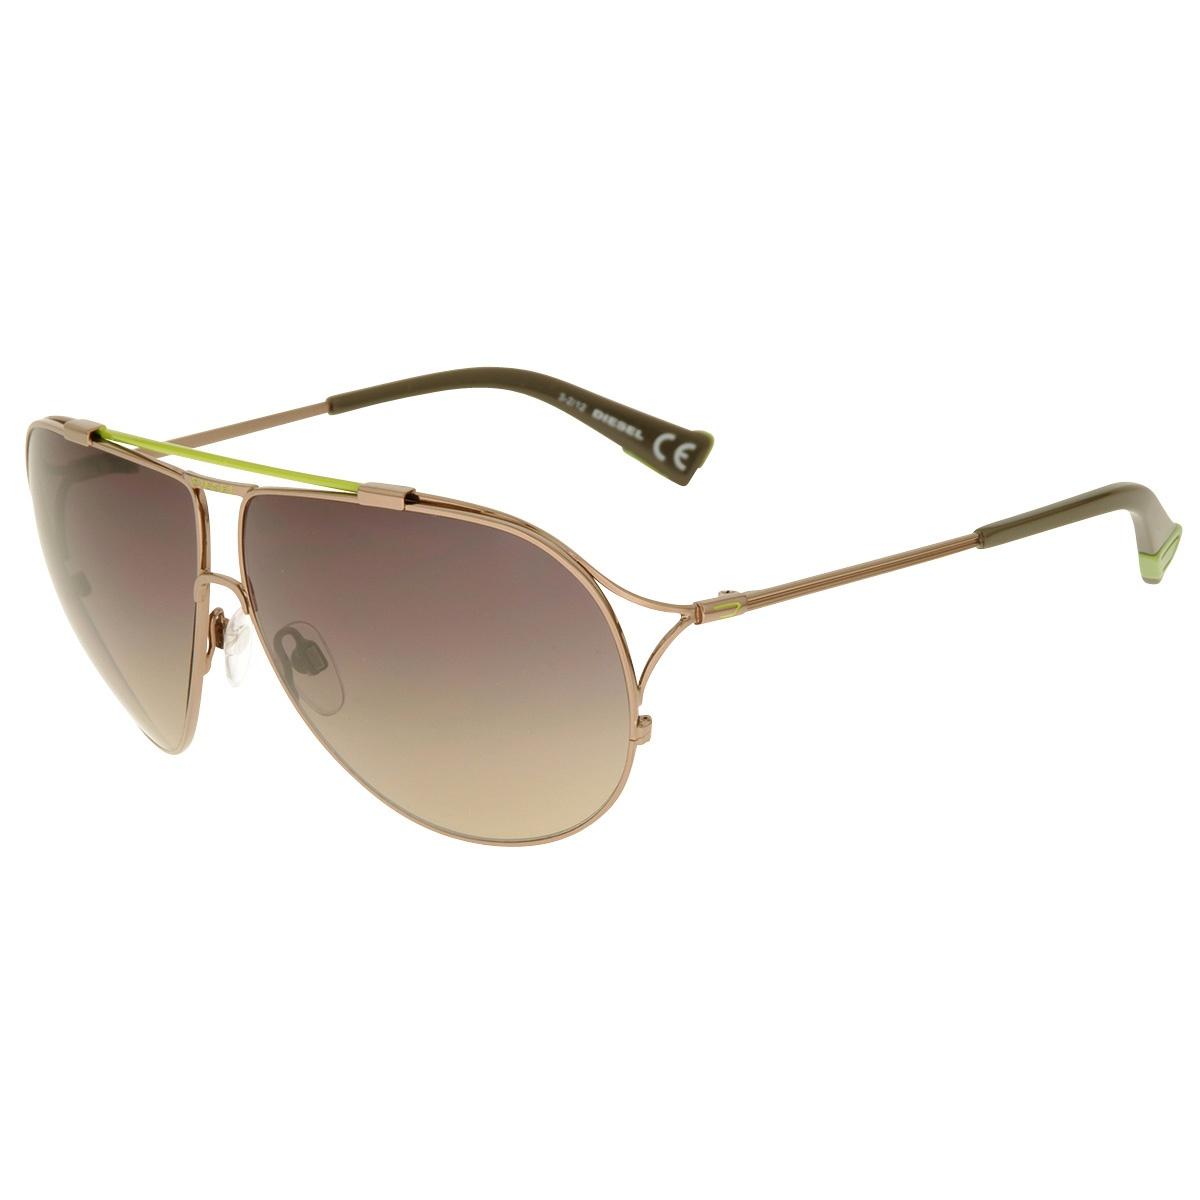 410cd20dc26e78 Diesel Sonnenbrille DL0017 6336B Herren Damen Silber Grün Sunglasses NEU    OVP